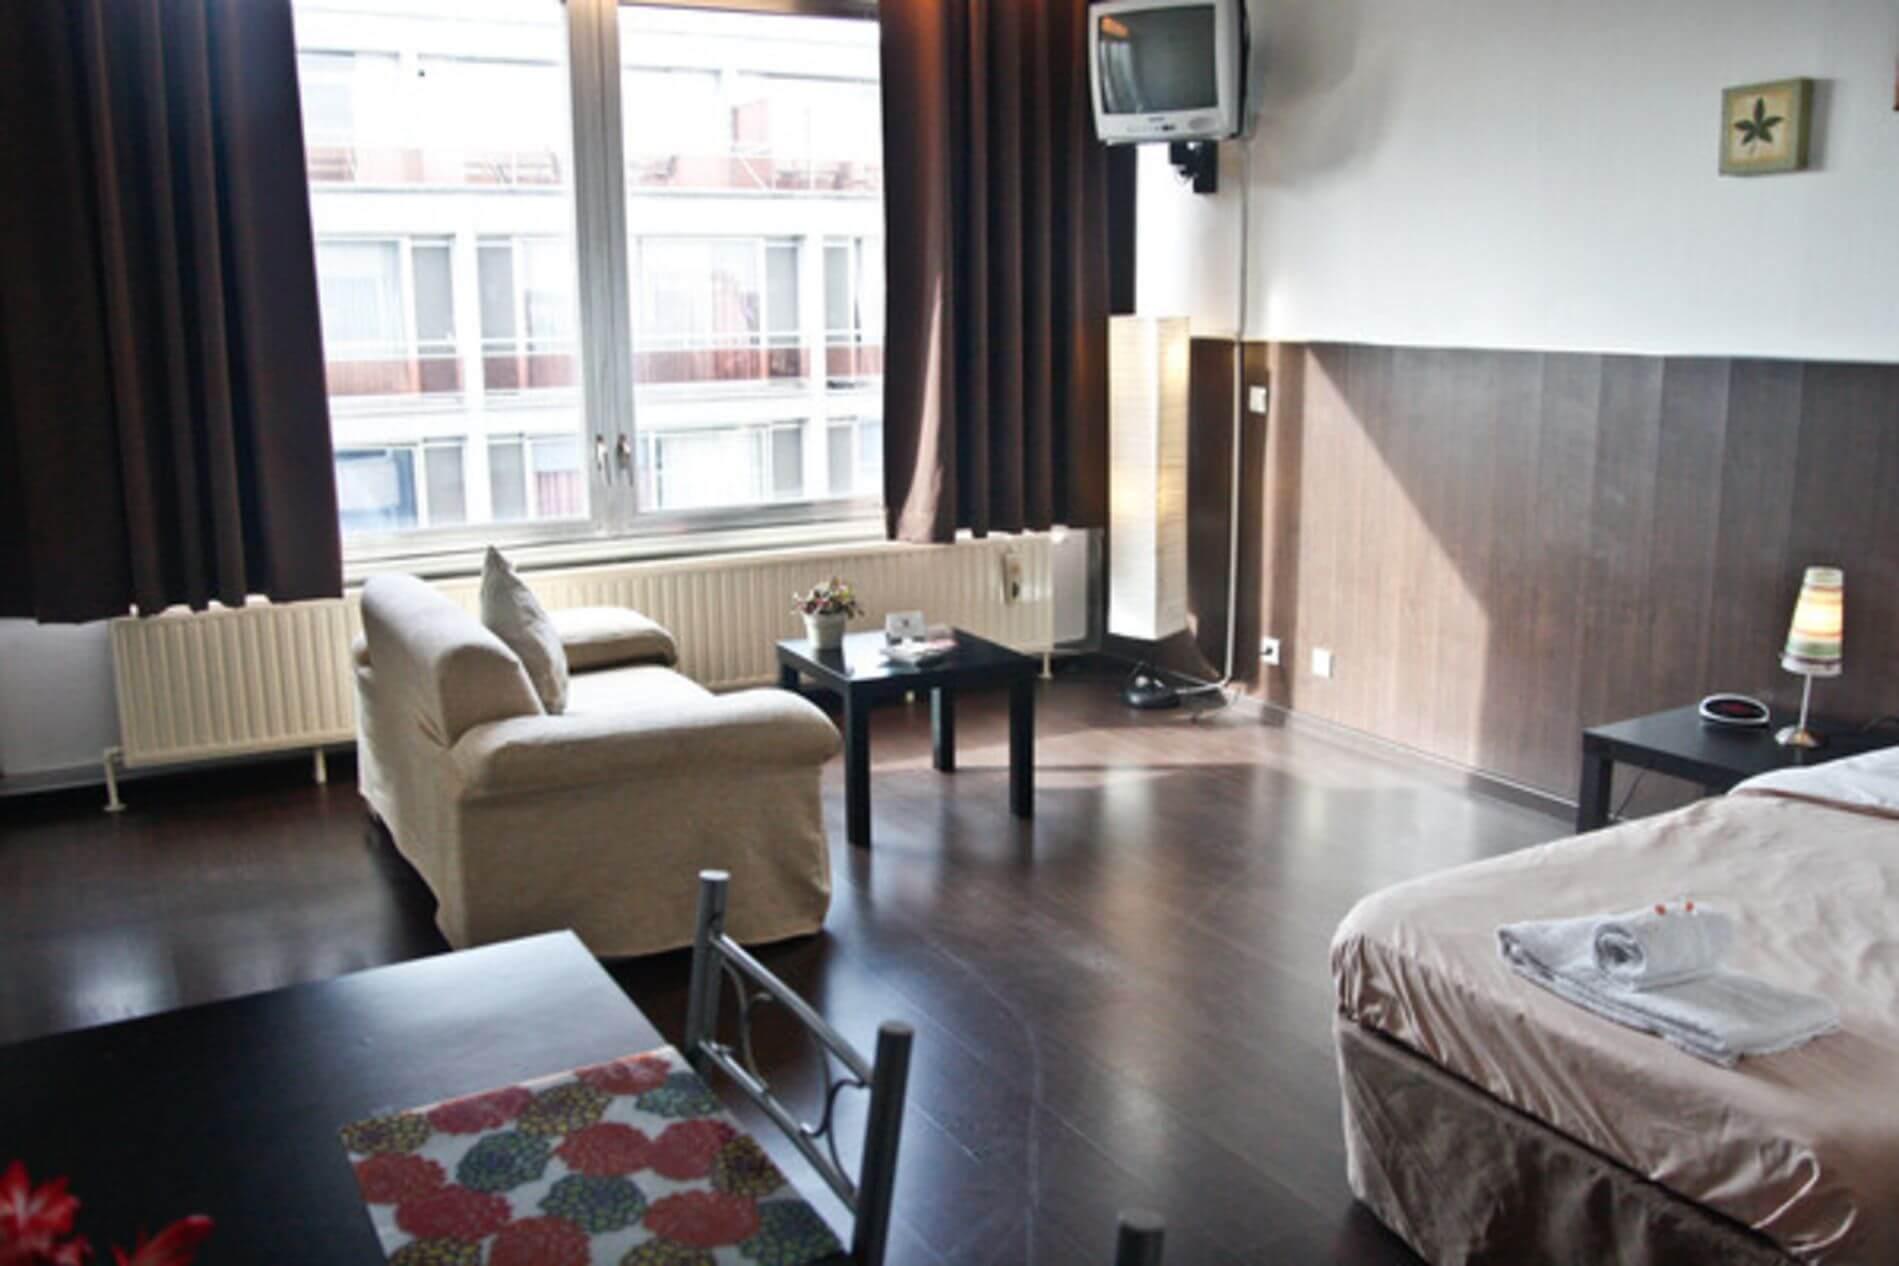 Spacious 1 room studio apartment in Antwerp